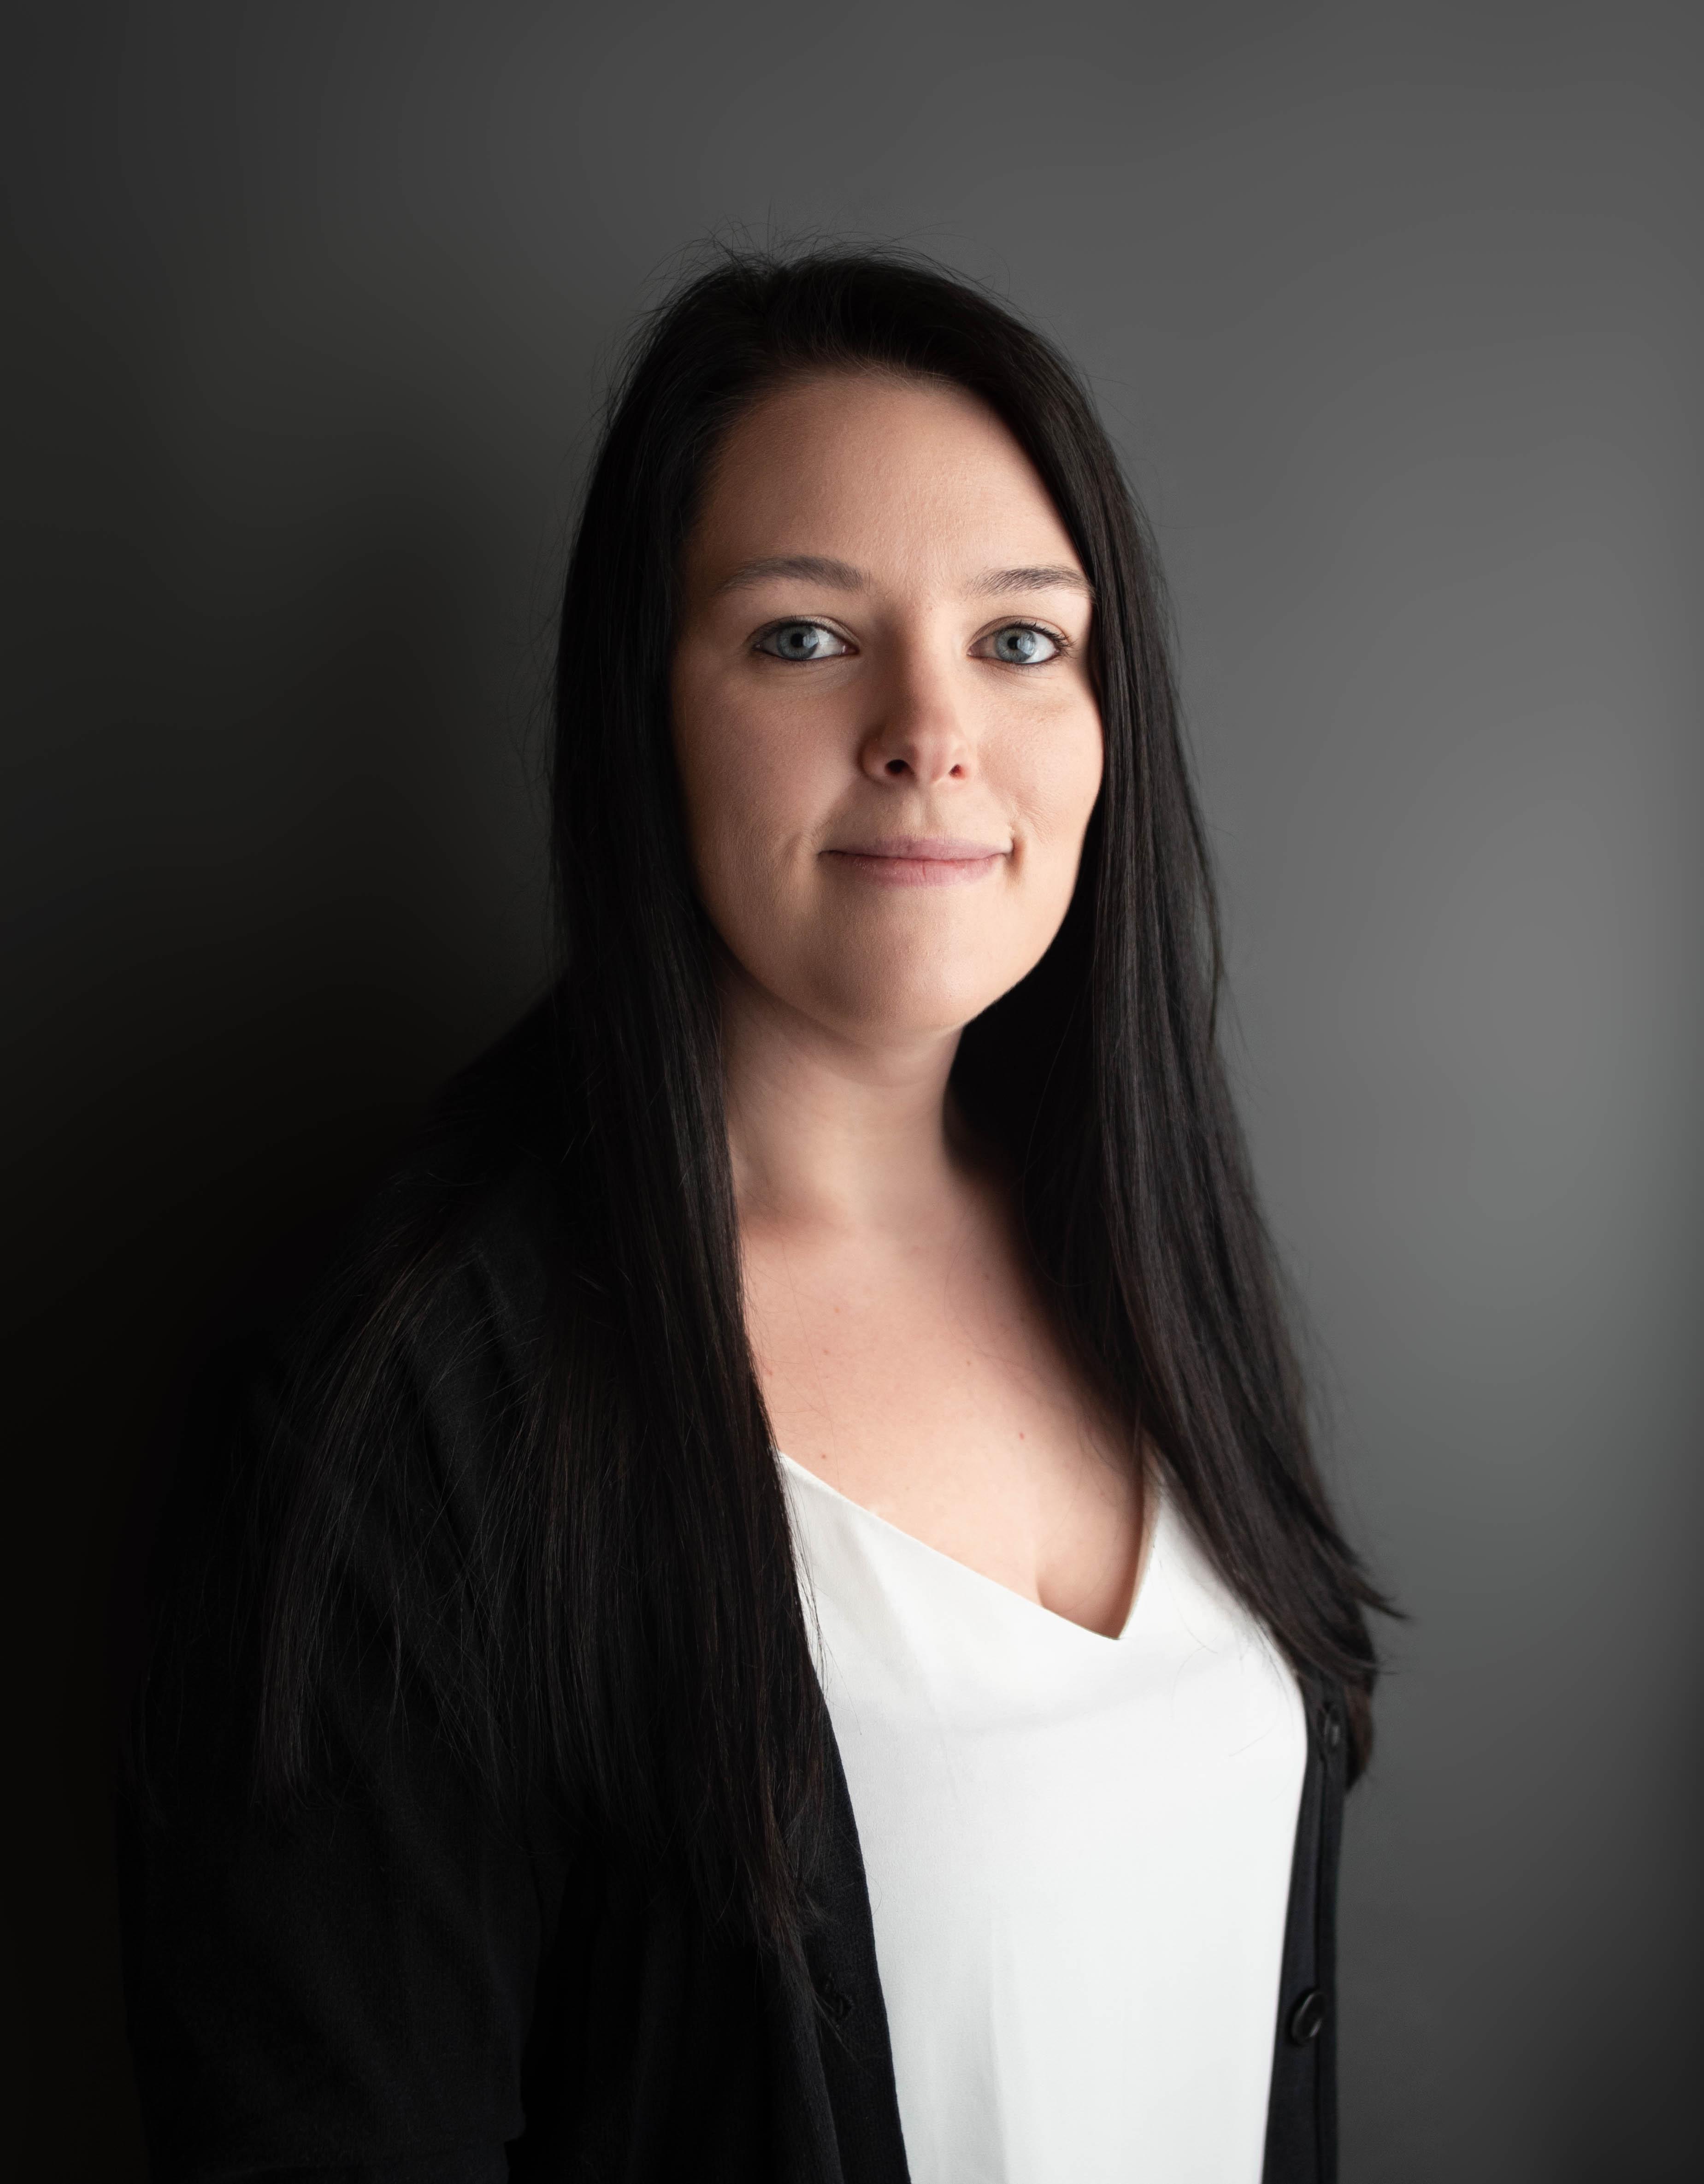 KAYLEE ANN CARLEY Financial Professional & Insurance Agent